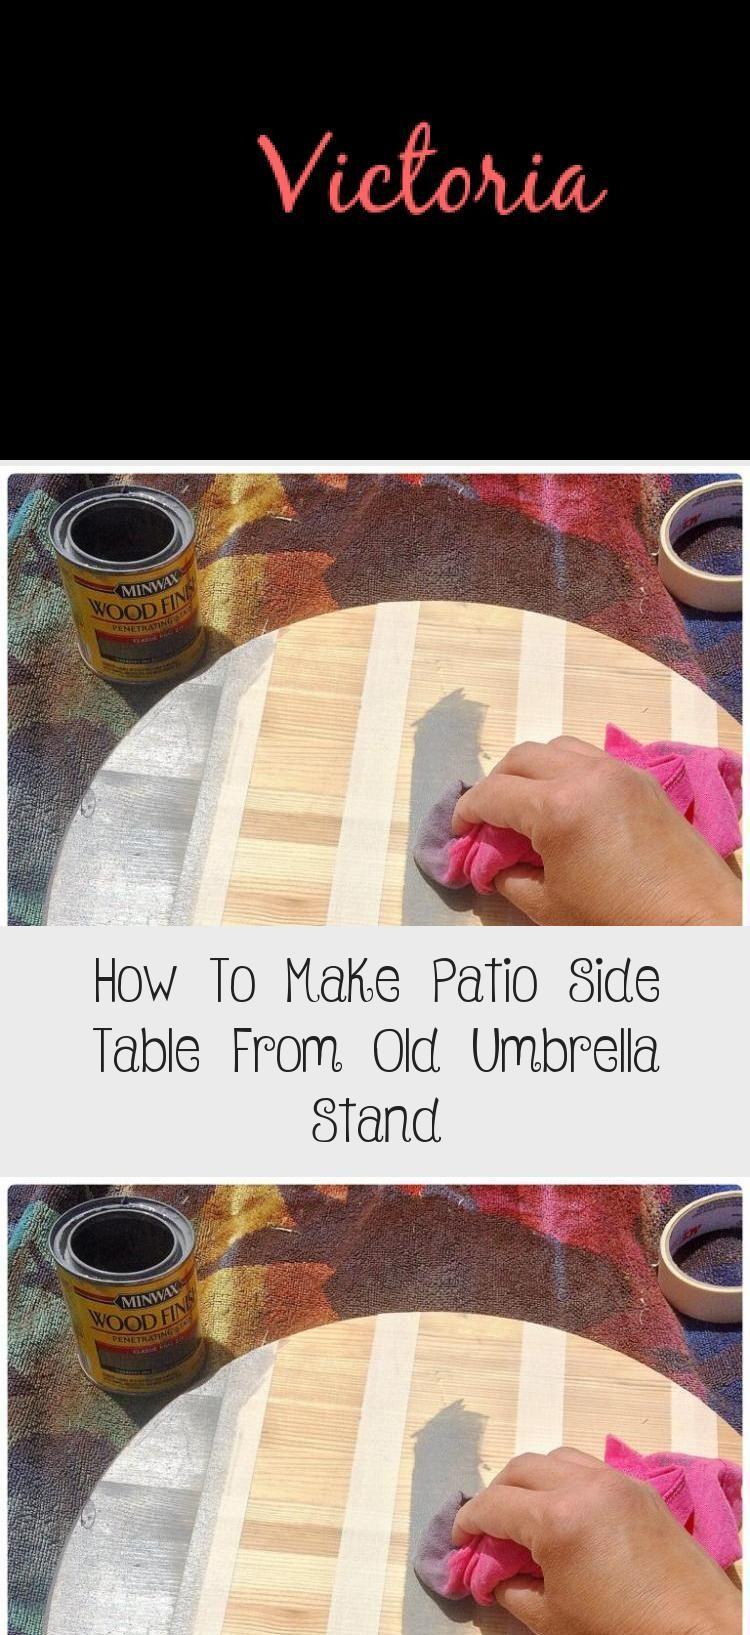 How To Make Patio Side Table From Old Umbrella Stand Garden Diygardeneasyhowtobuild Garden P In 2020 Patio Side Table Outdoor Umbrella Stand Diy Patio